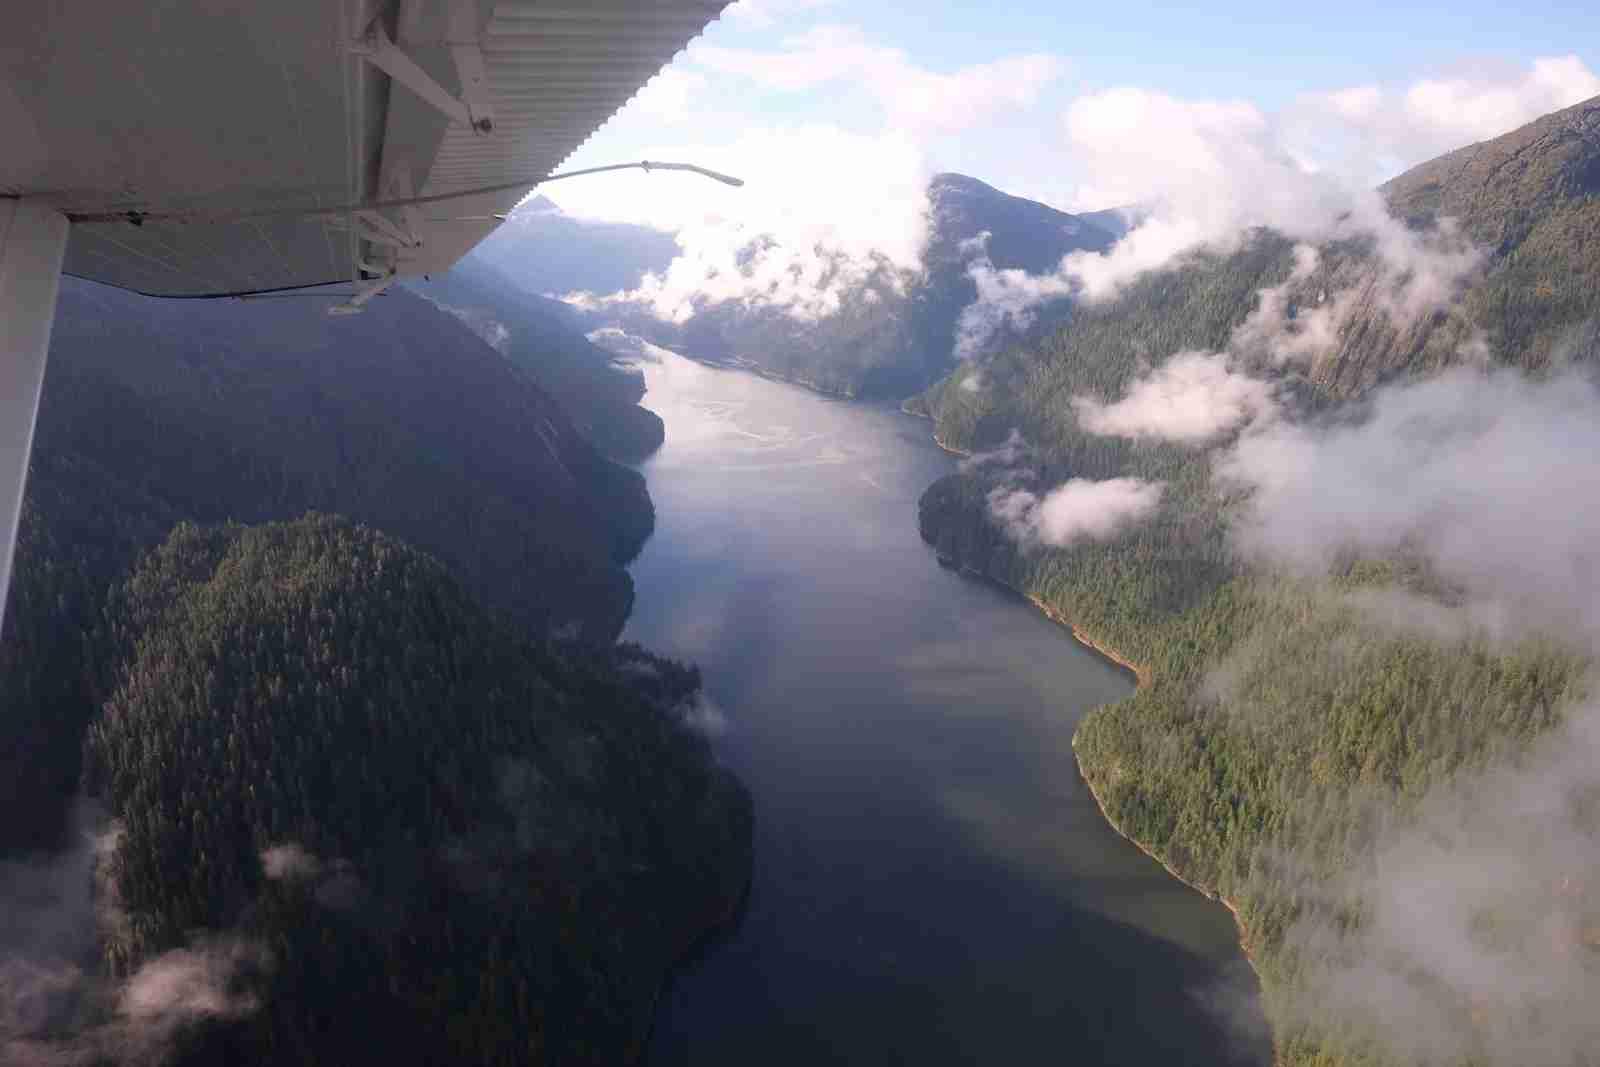 The fjords of Alaska. (Photo by Bruce Warrington/Unsplash)